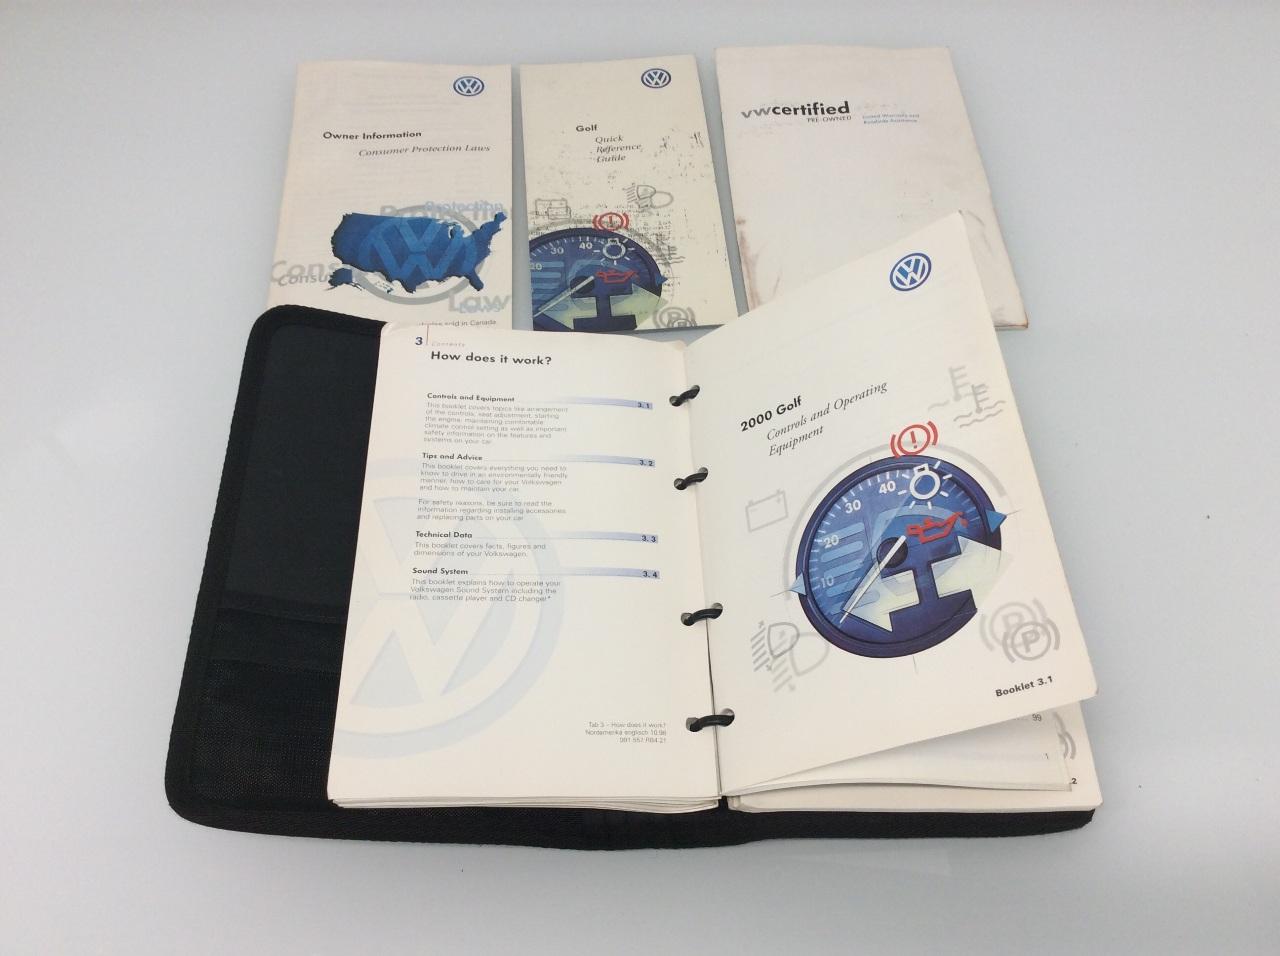 2000 volkswagen golf owners manual torn cover ebay rh ebay com Volkswagen Golf TDI Volkswagen Golf Manual Transmission